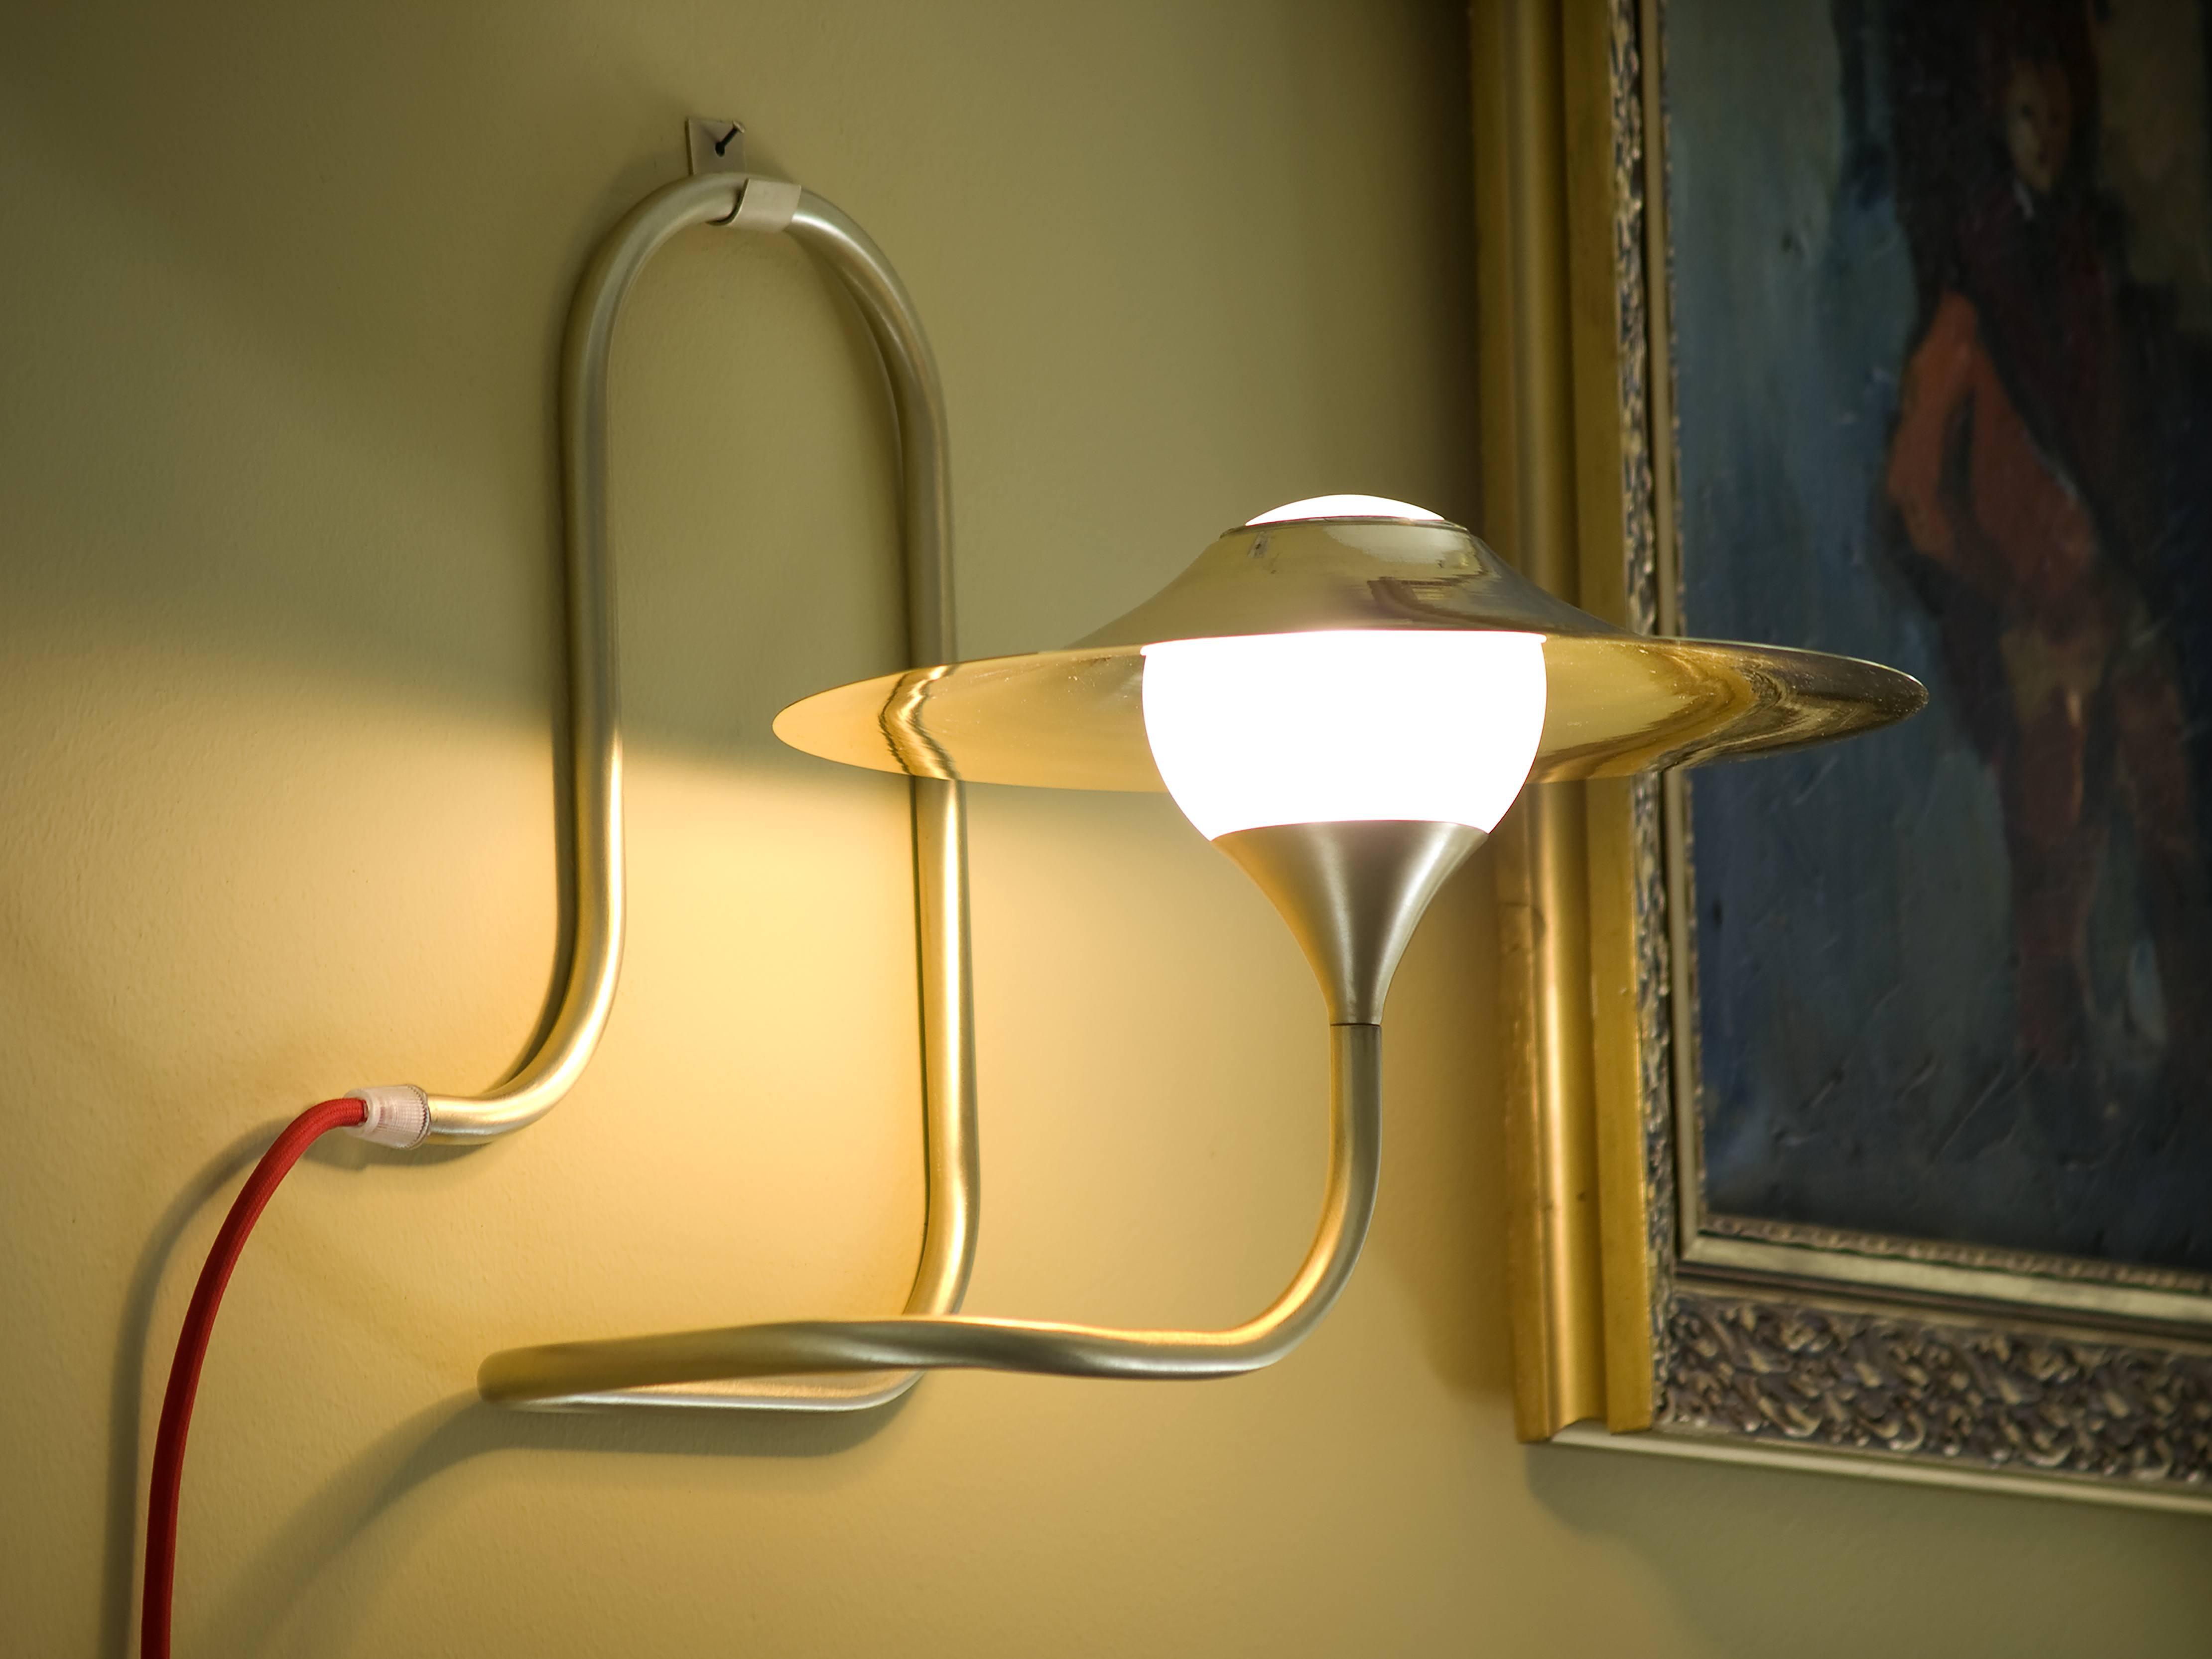 Turbaya Copper Wall Lamp - Brass Body - merk: Intueri Light